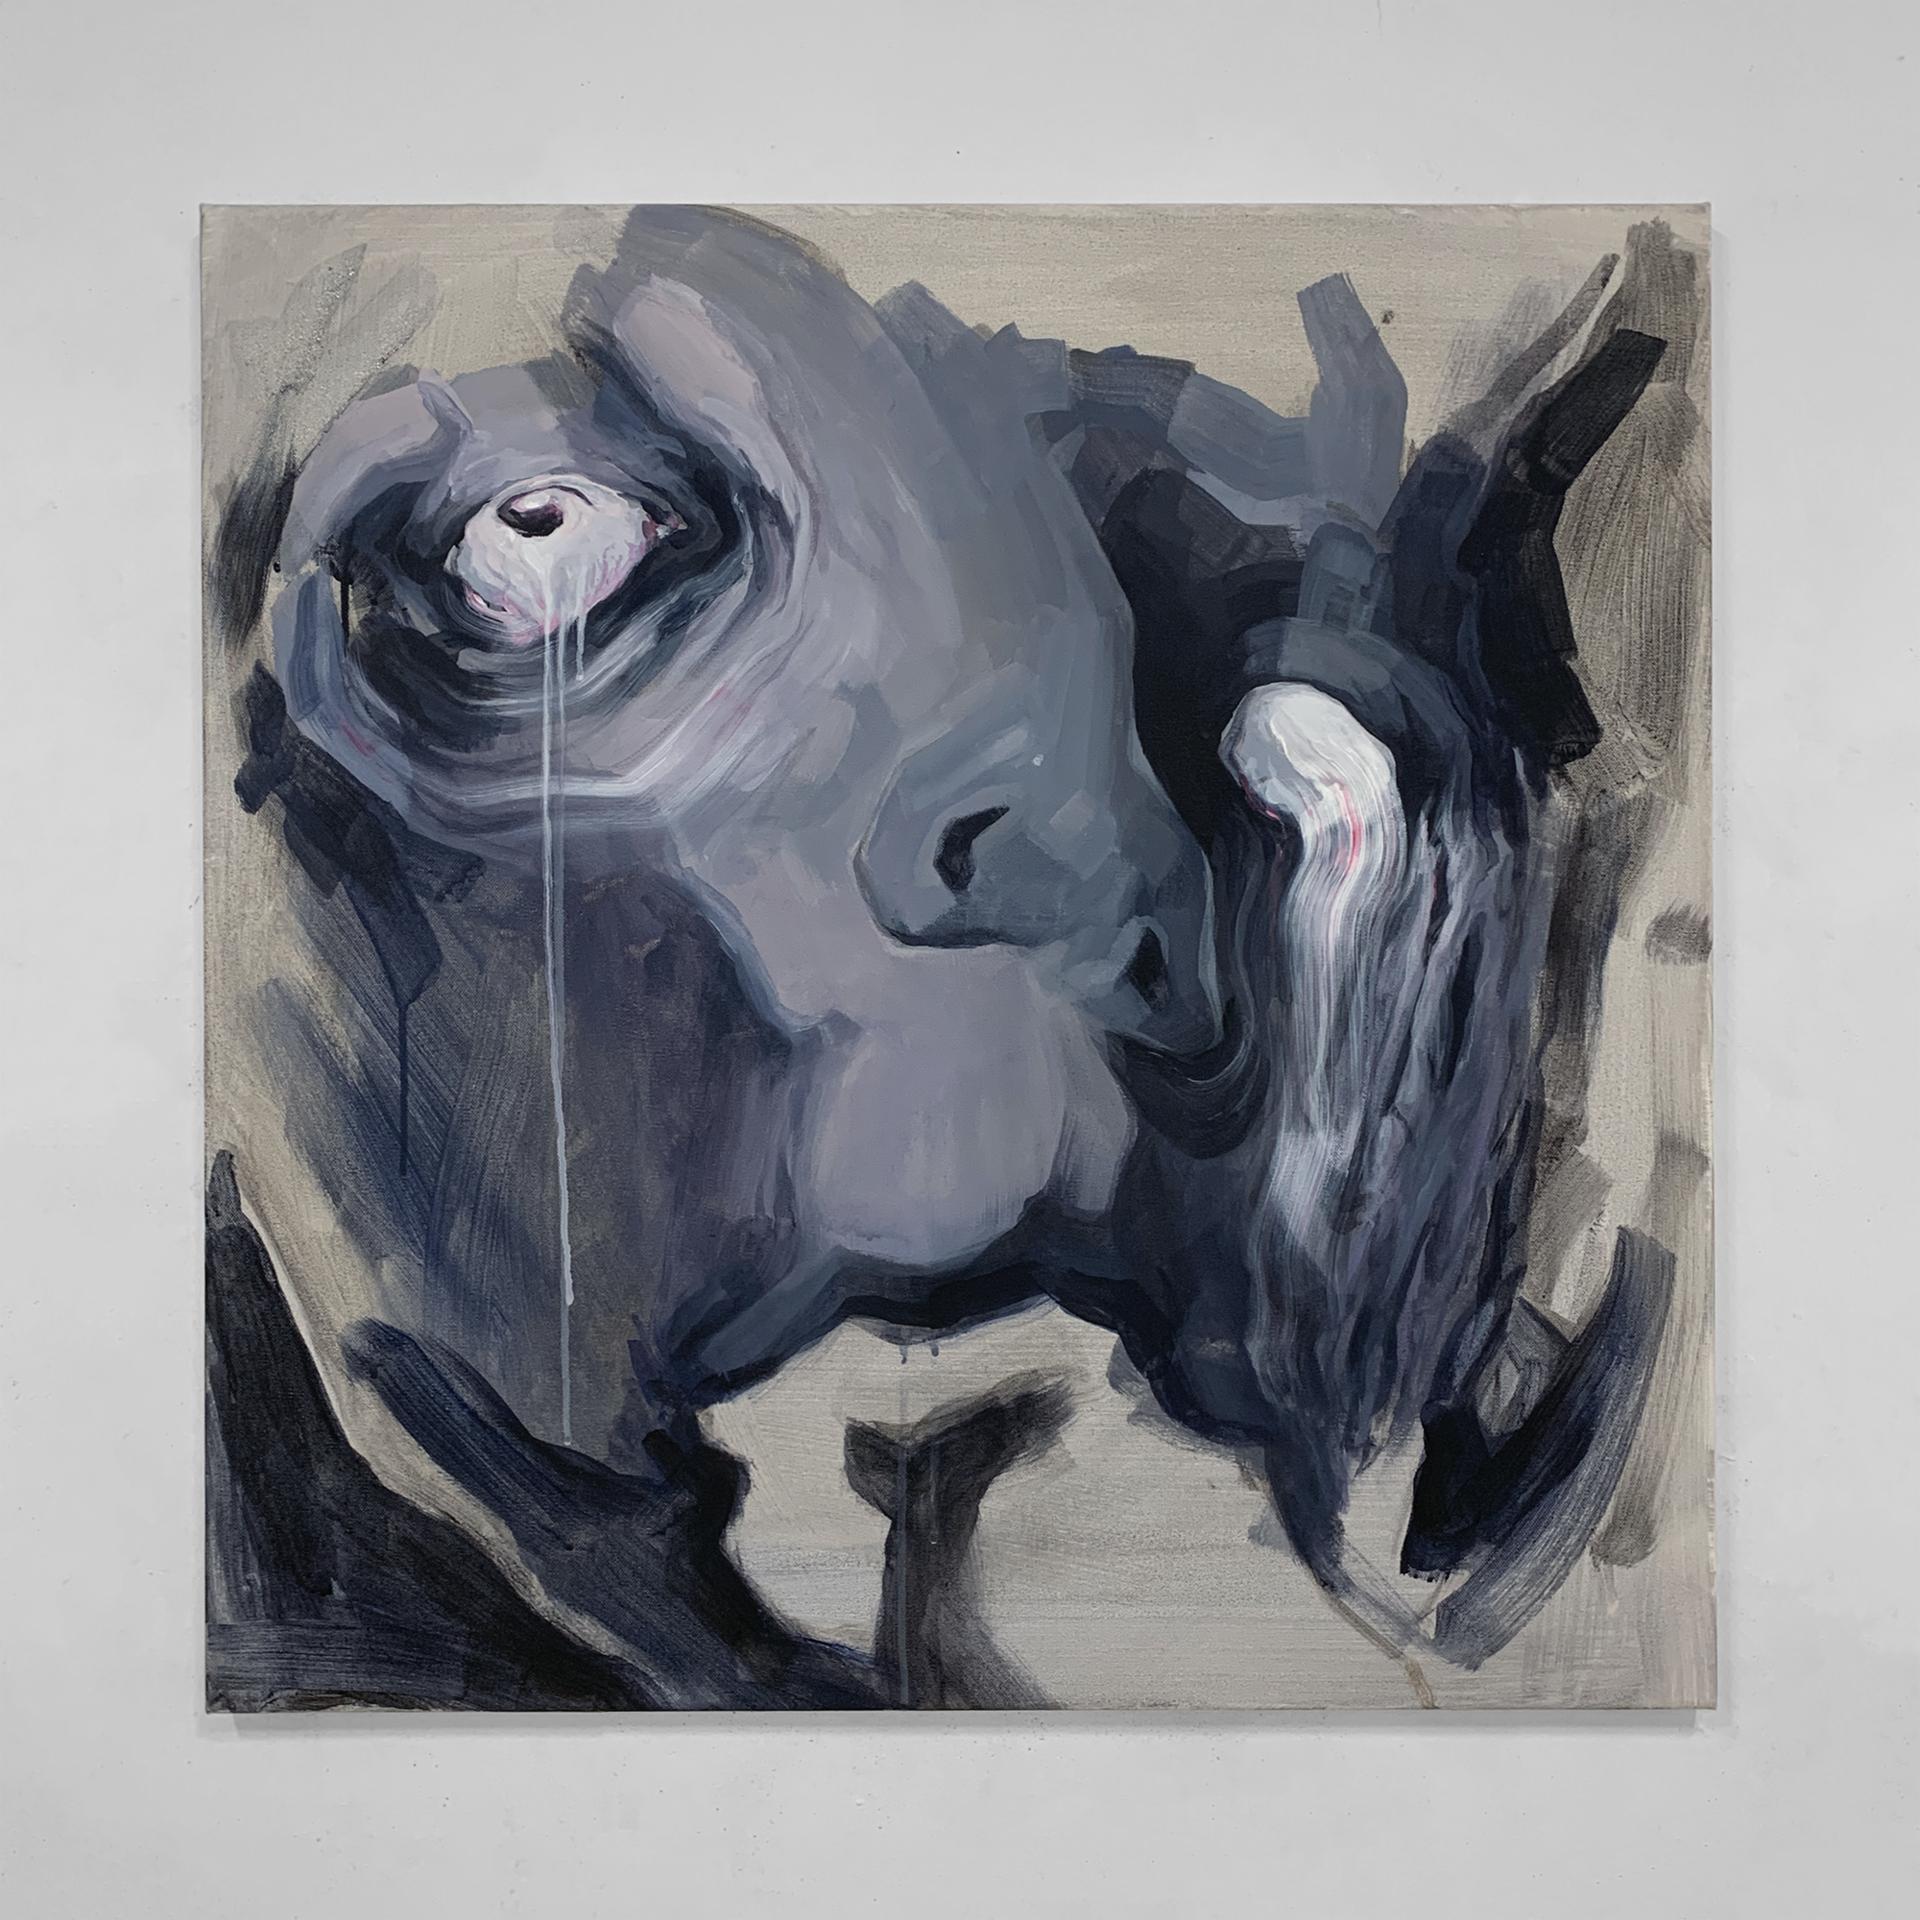 """Sleepless Nights"" / 73x73cm / Acrylic on canvas / 2020"